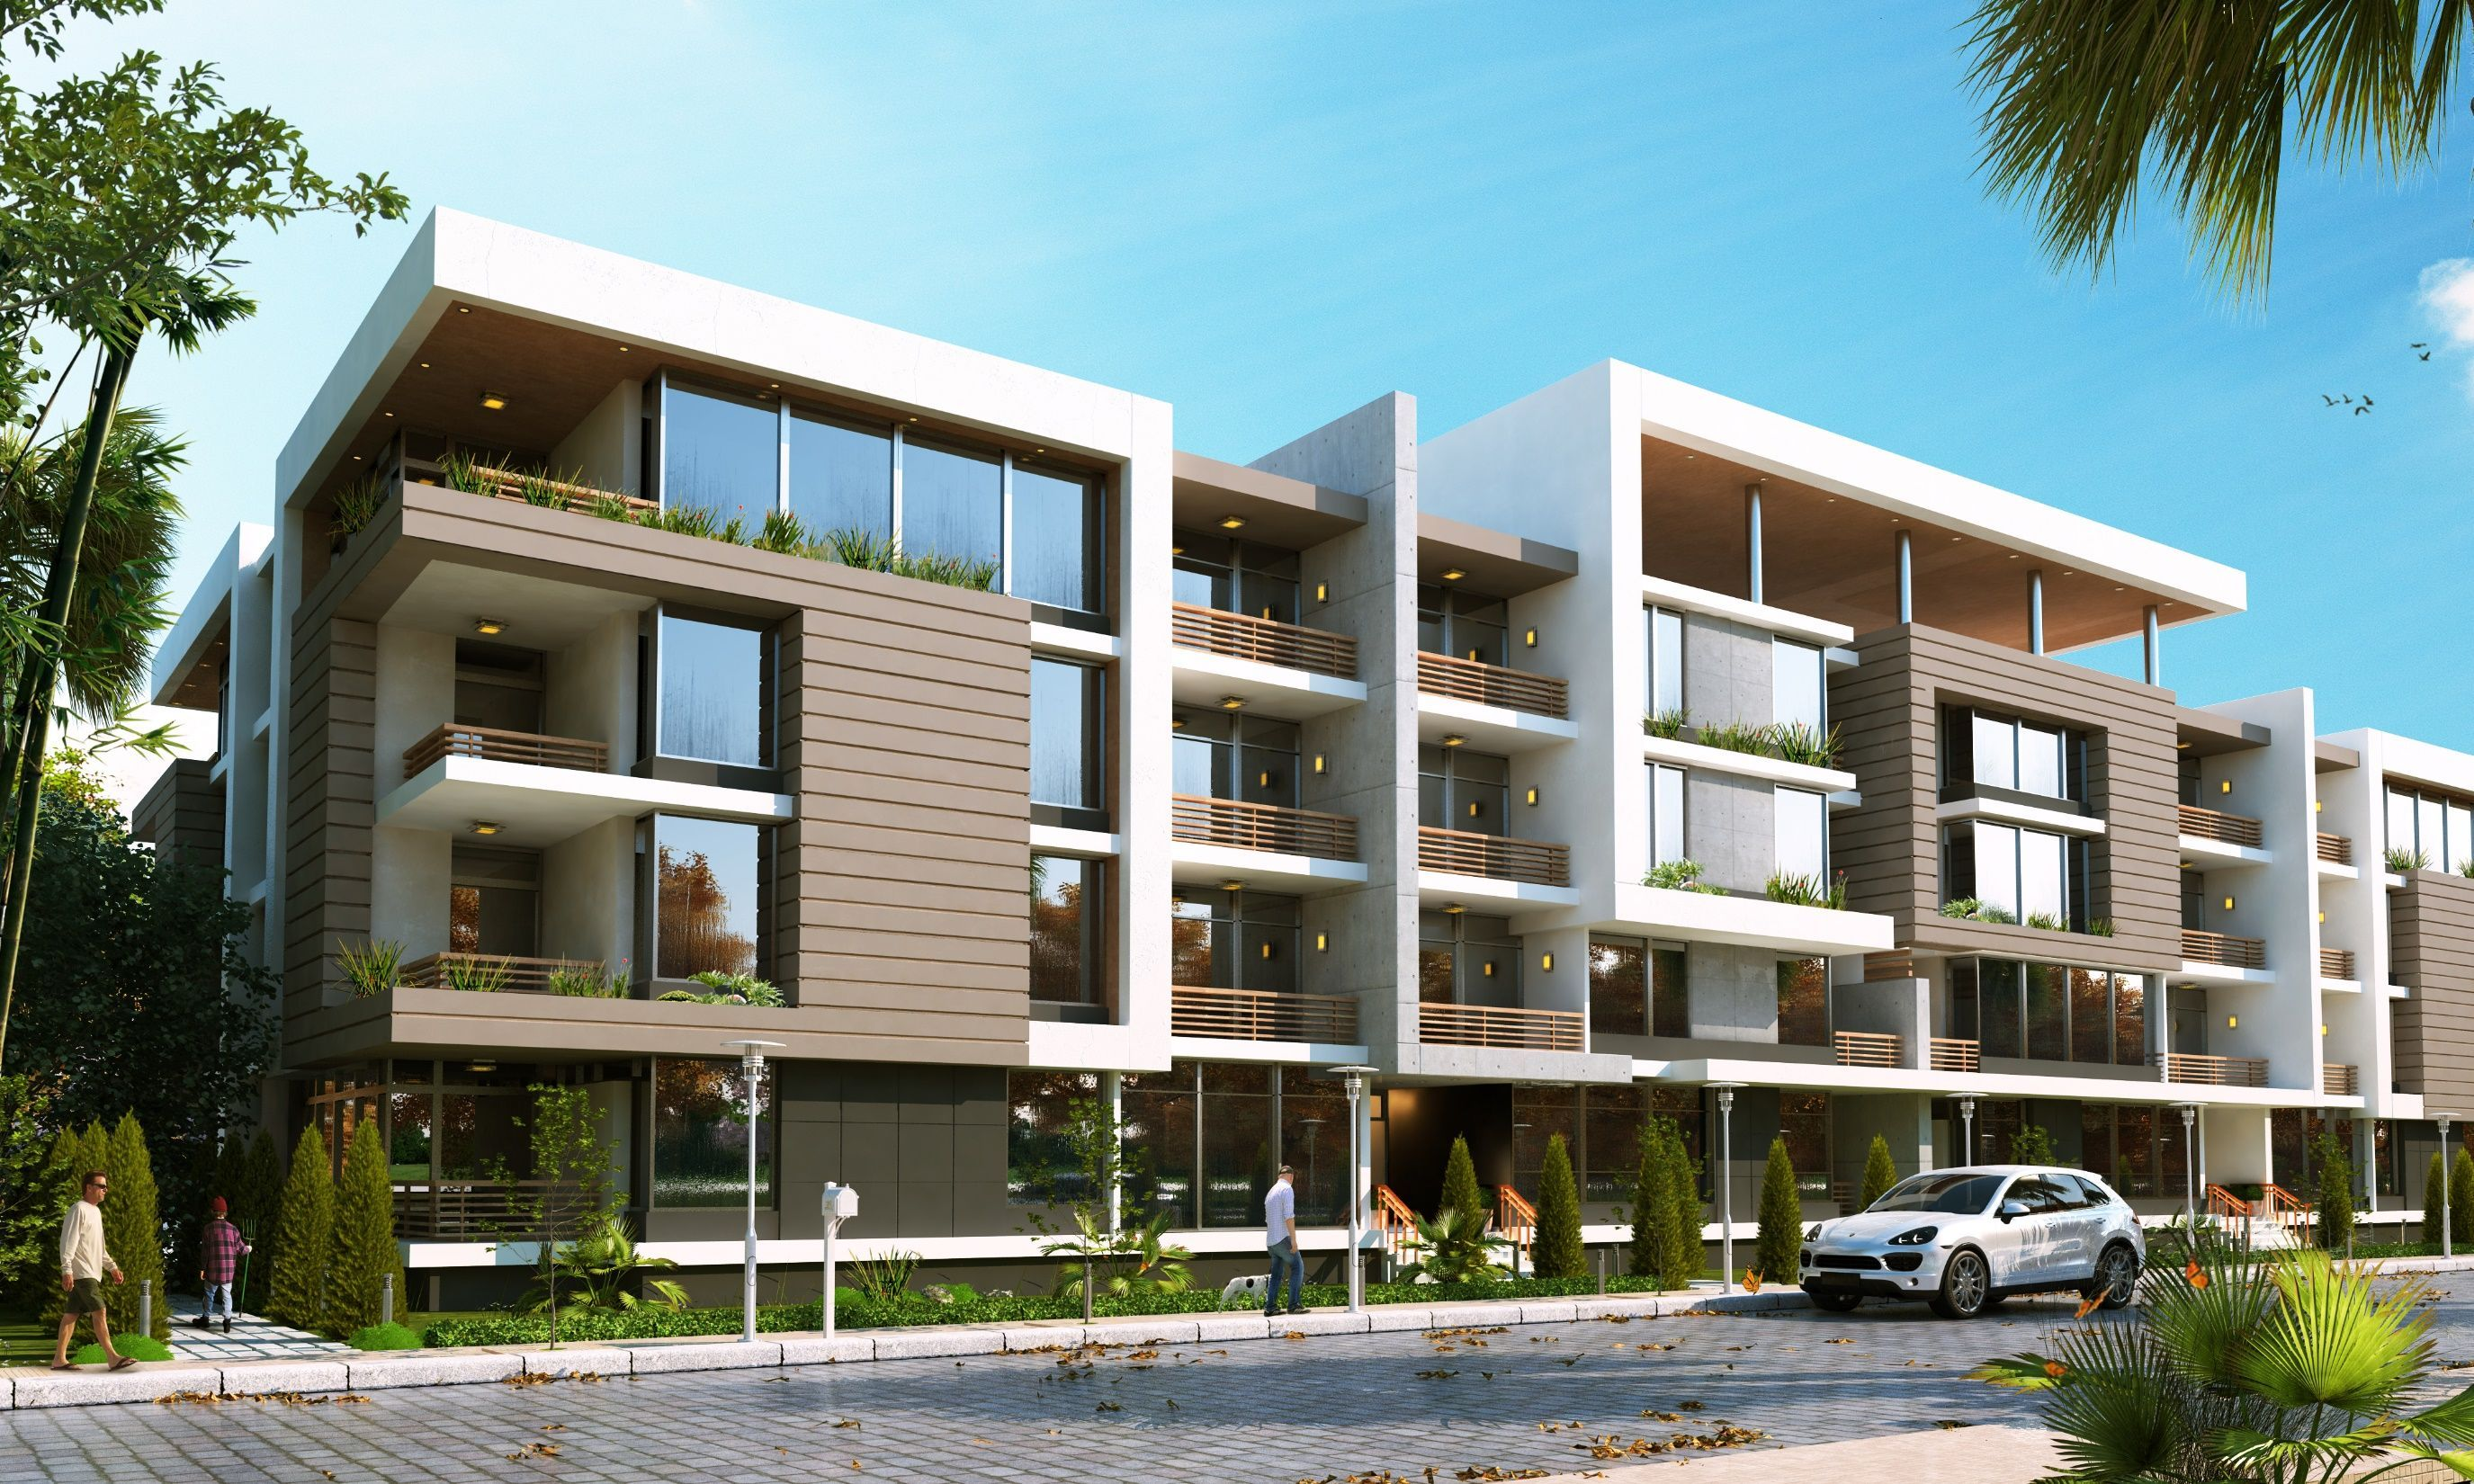 Residential Simple Apartment Exterior Design - BESTHOMISH